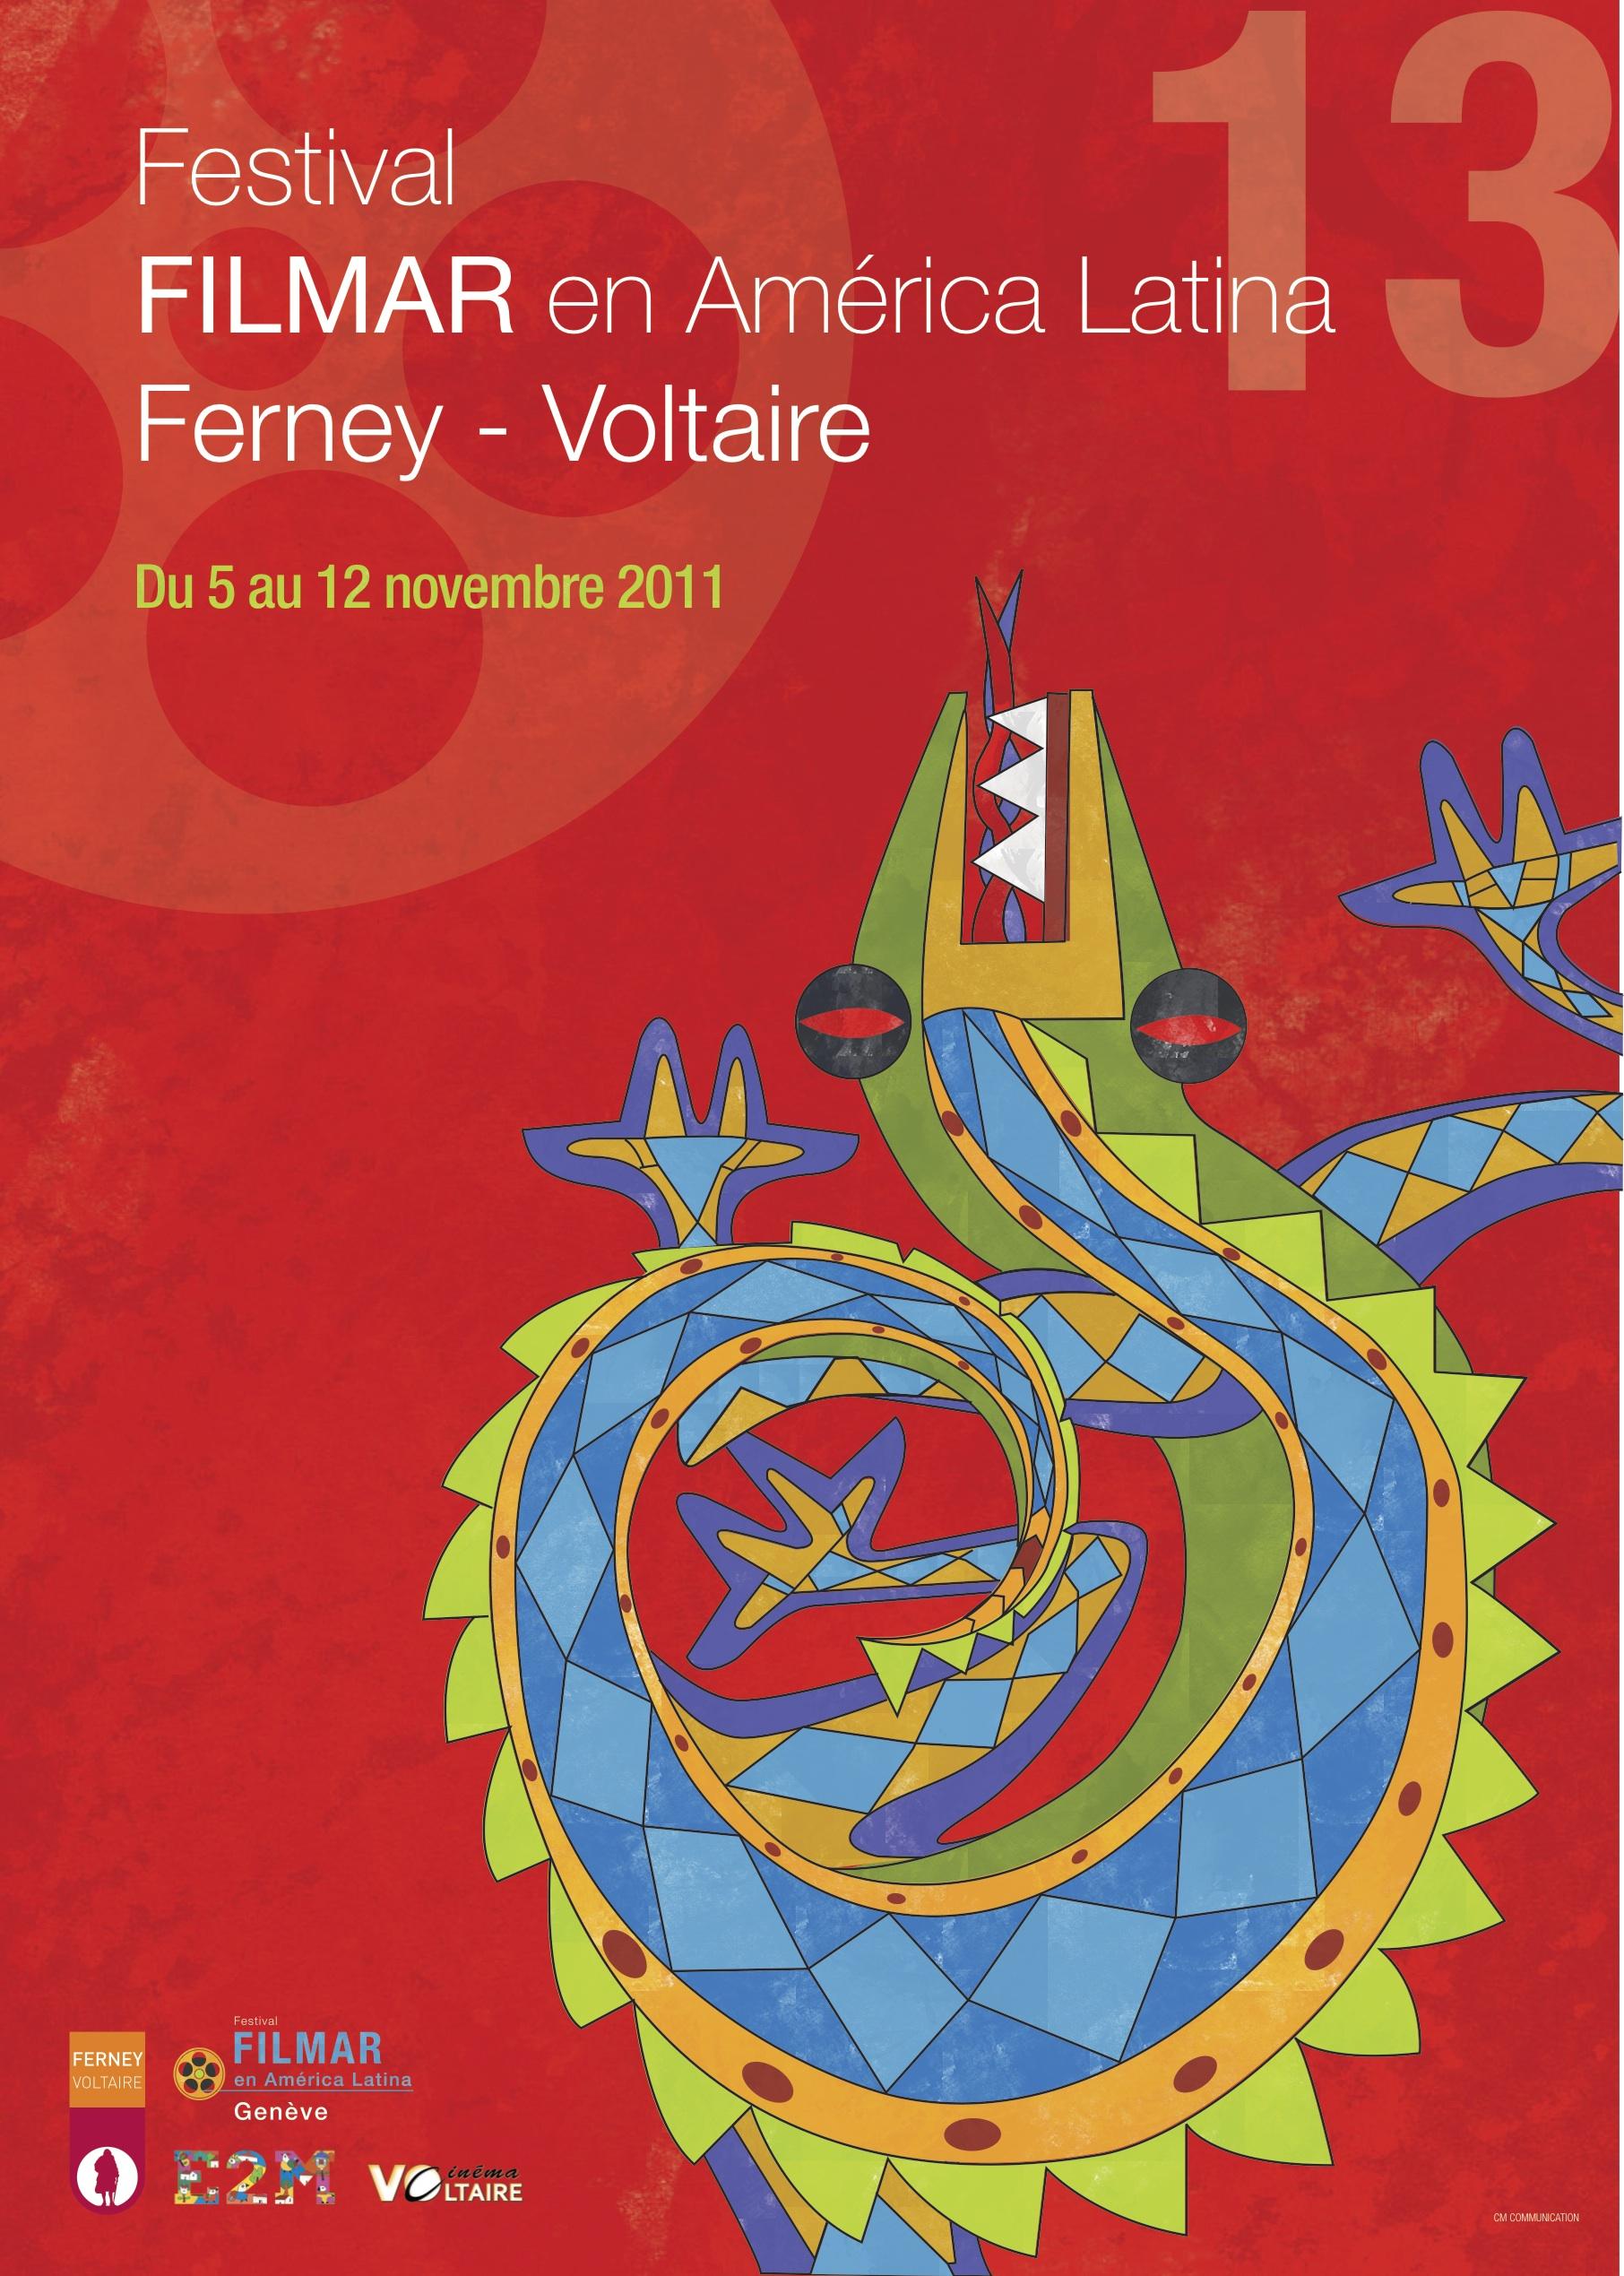 Festival filmar en am rica latina encuentro de dos mundos - Office du tourisme ferney voltaire ...